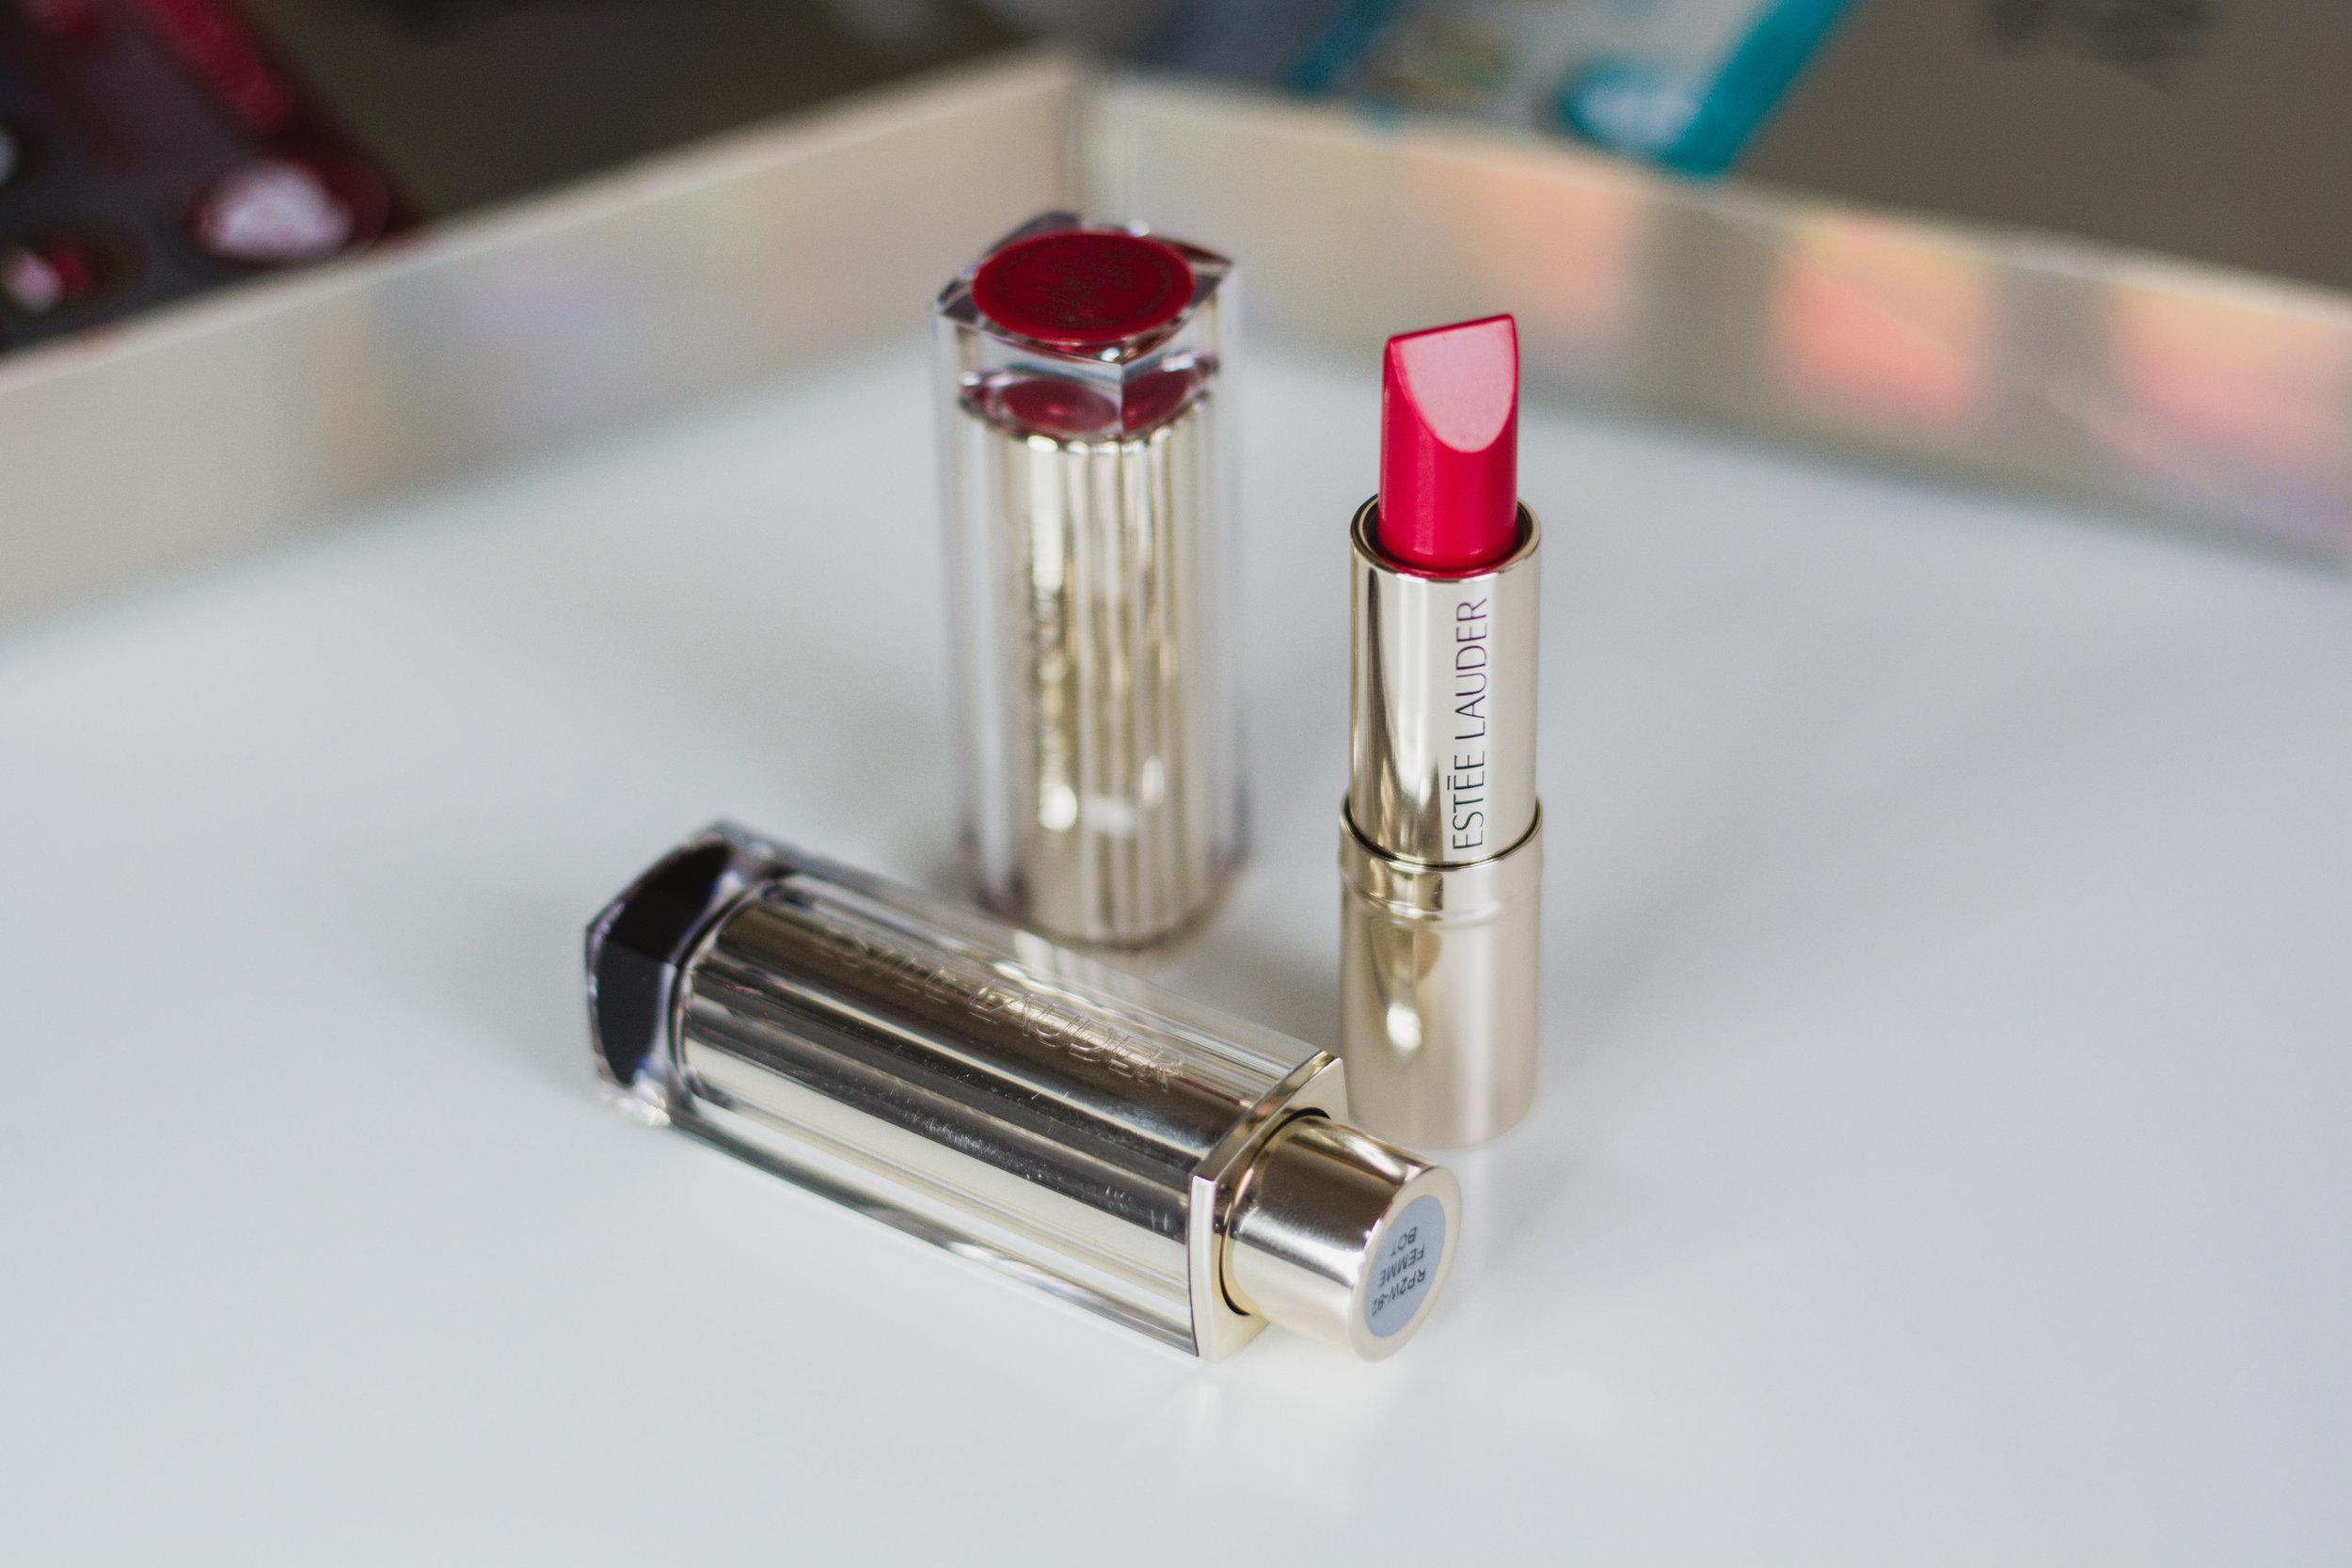 Hydrating-lipsticks_estee-lauder_loreal_shiseido_happy-skin_review-philippines_2019_6.jpg